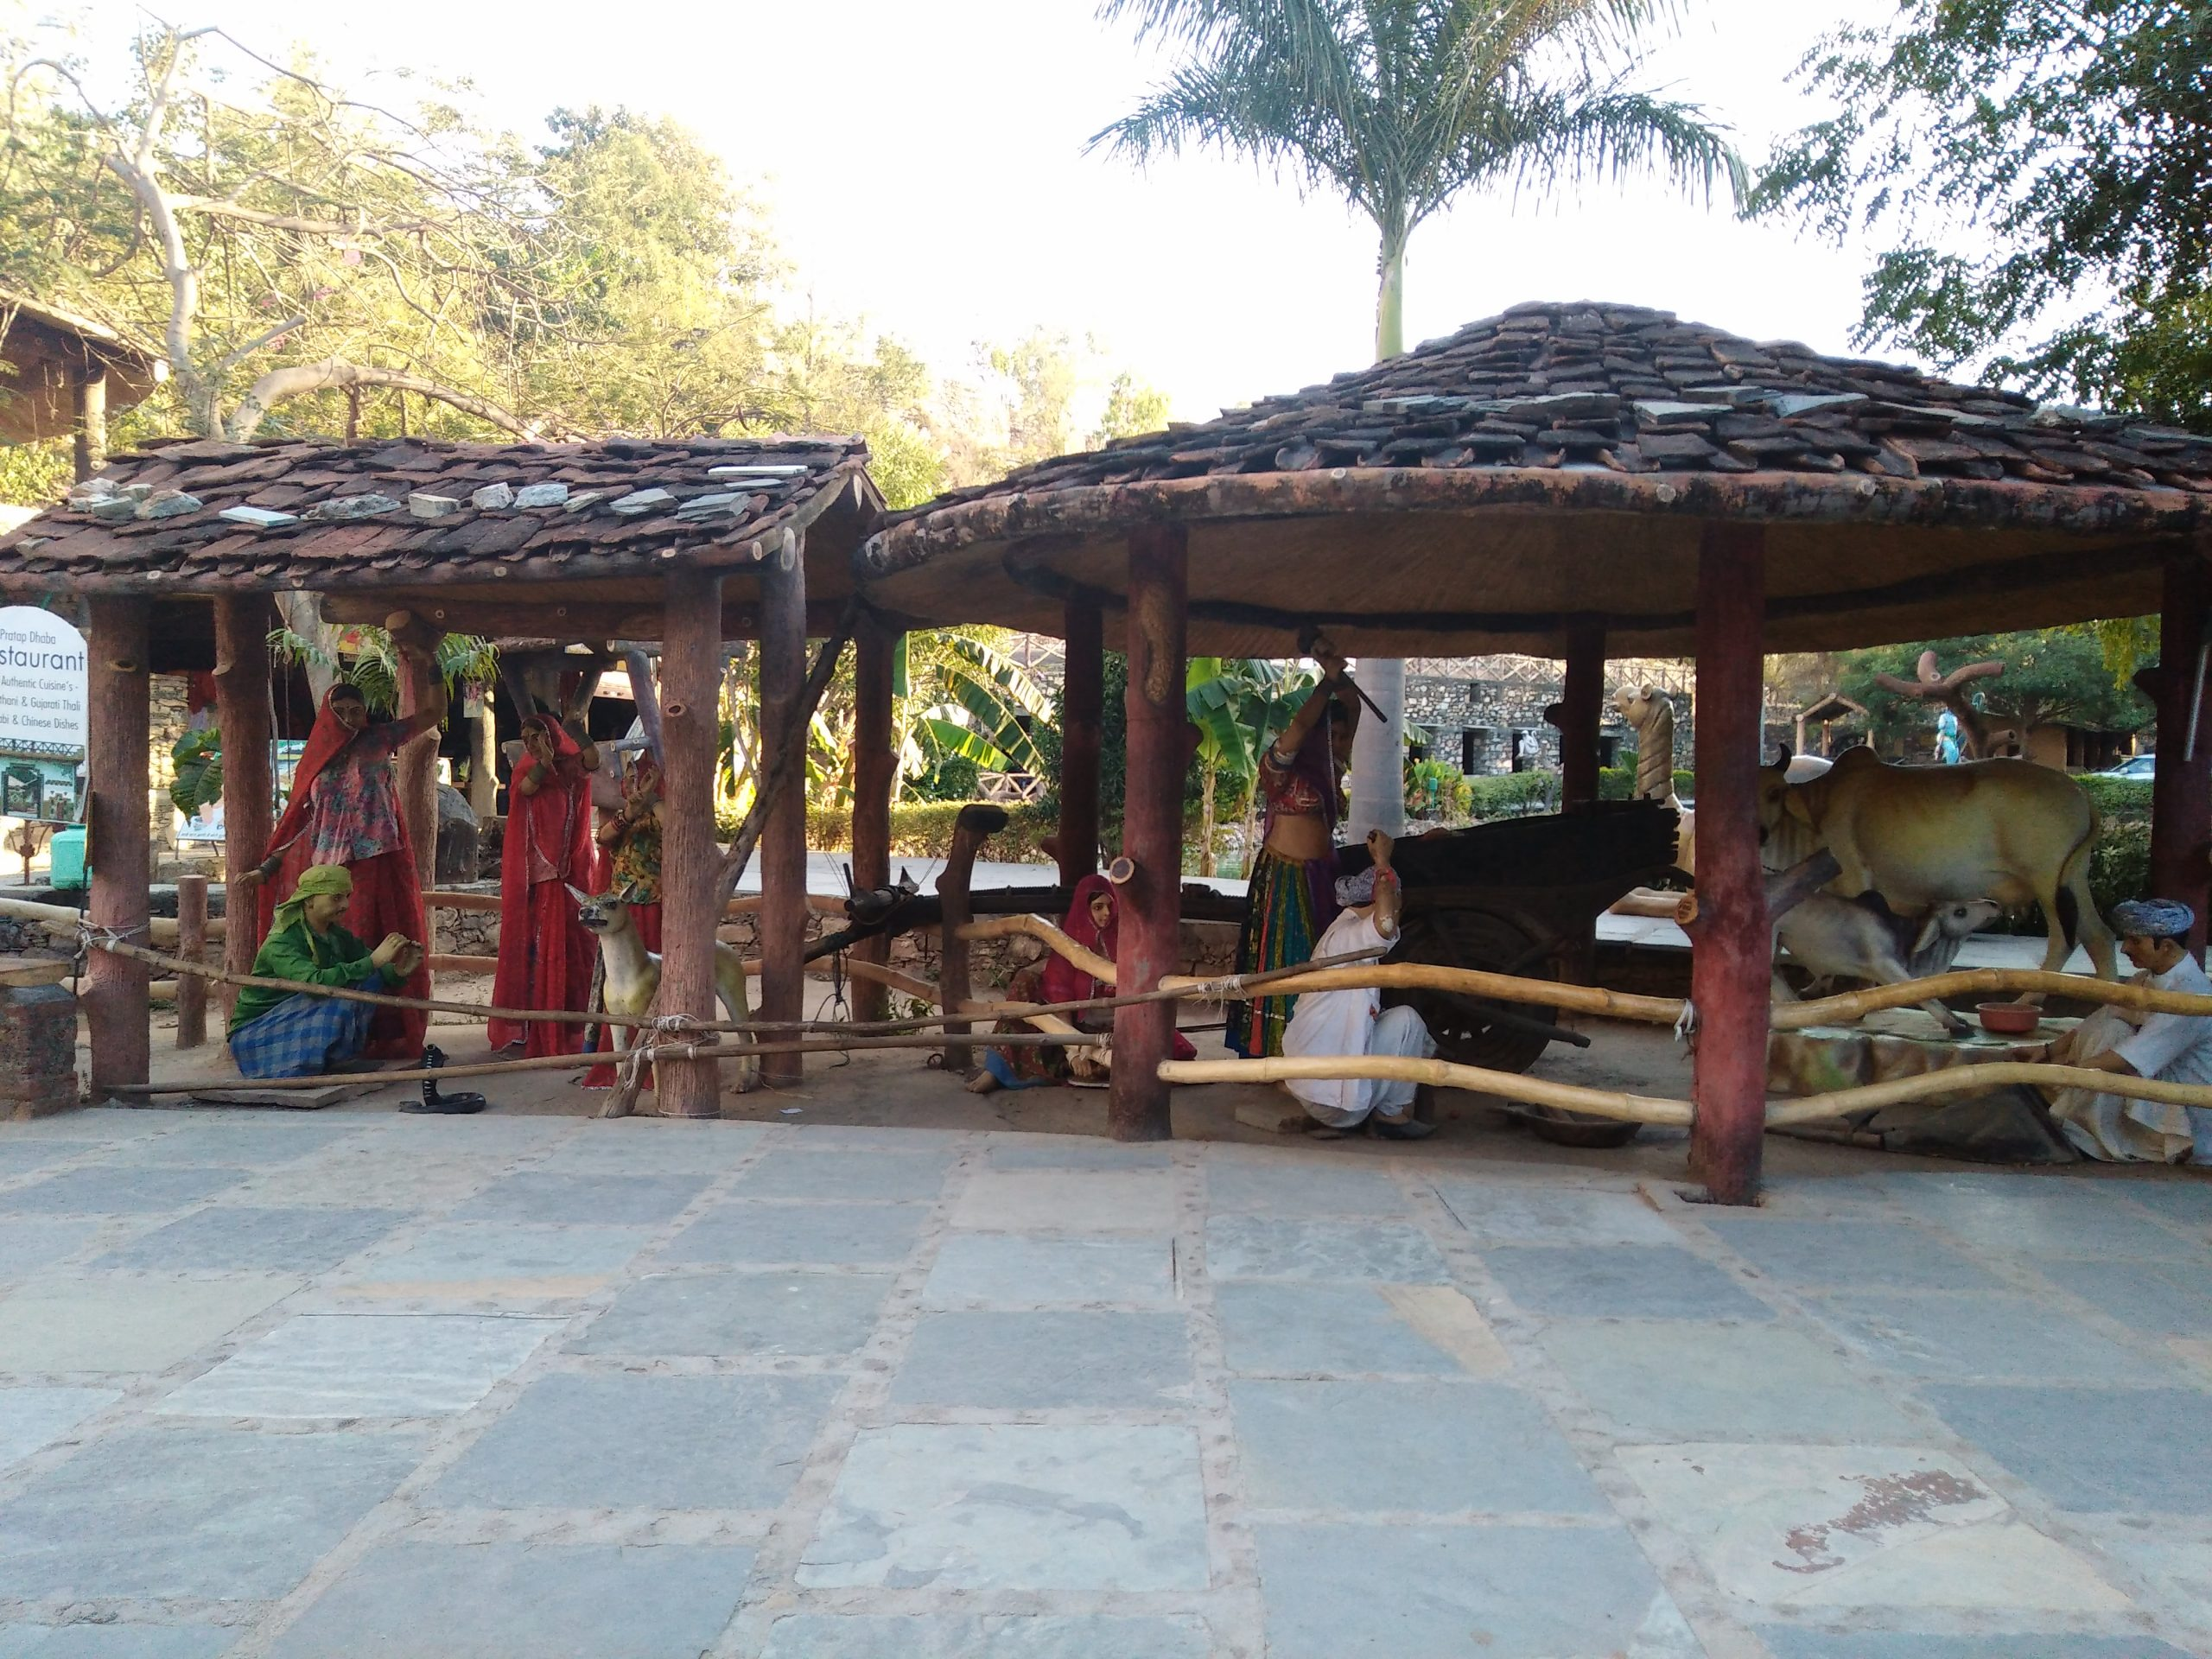 A village showcase